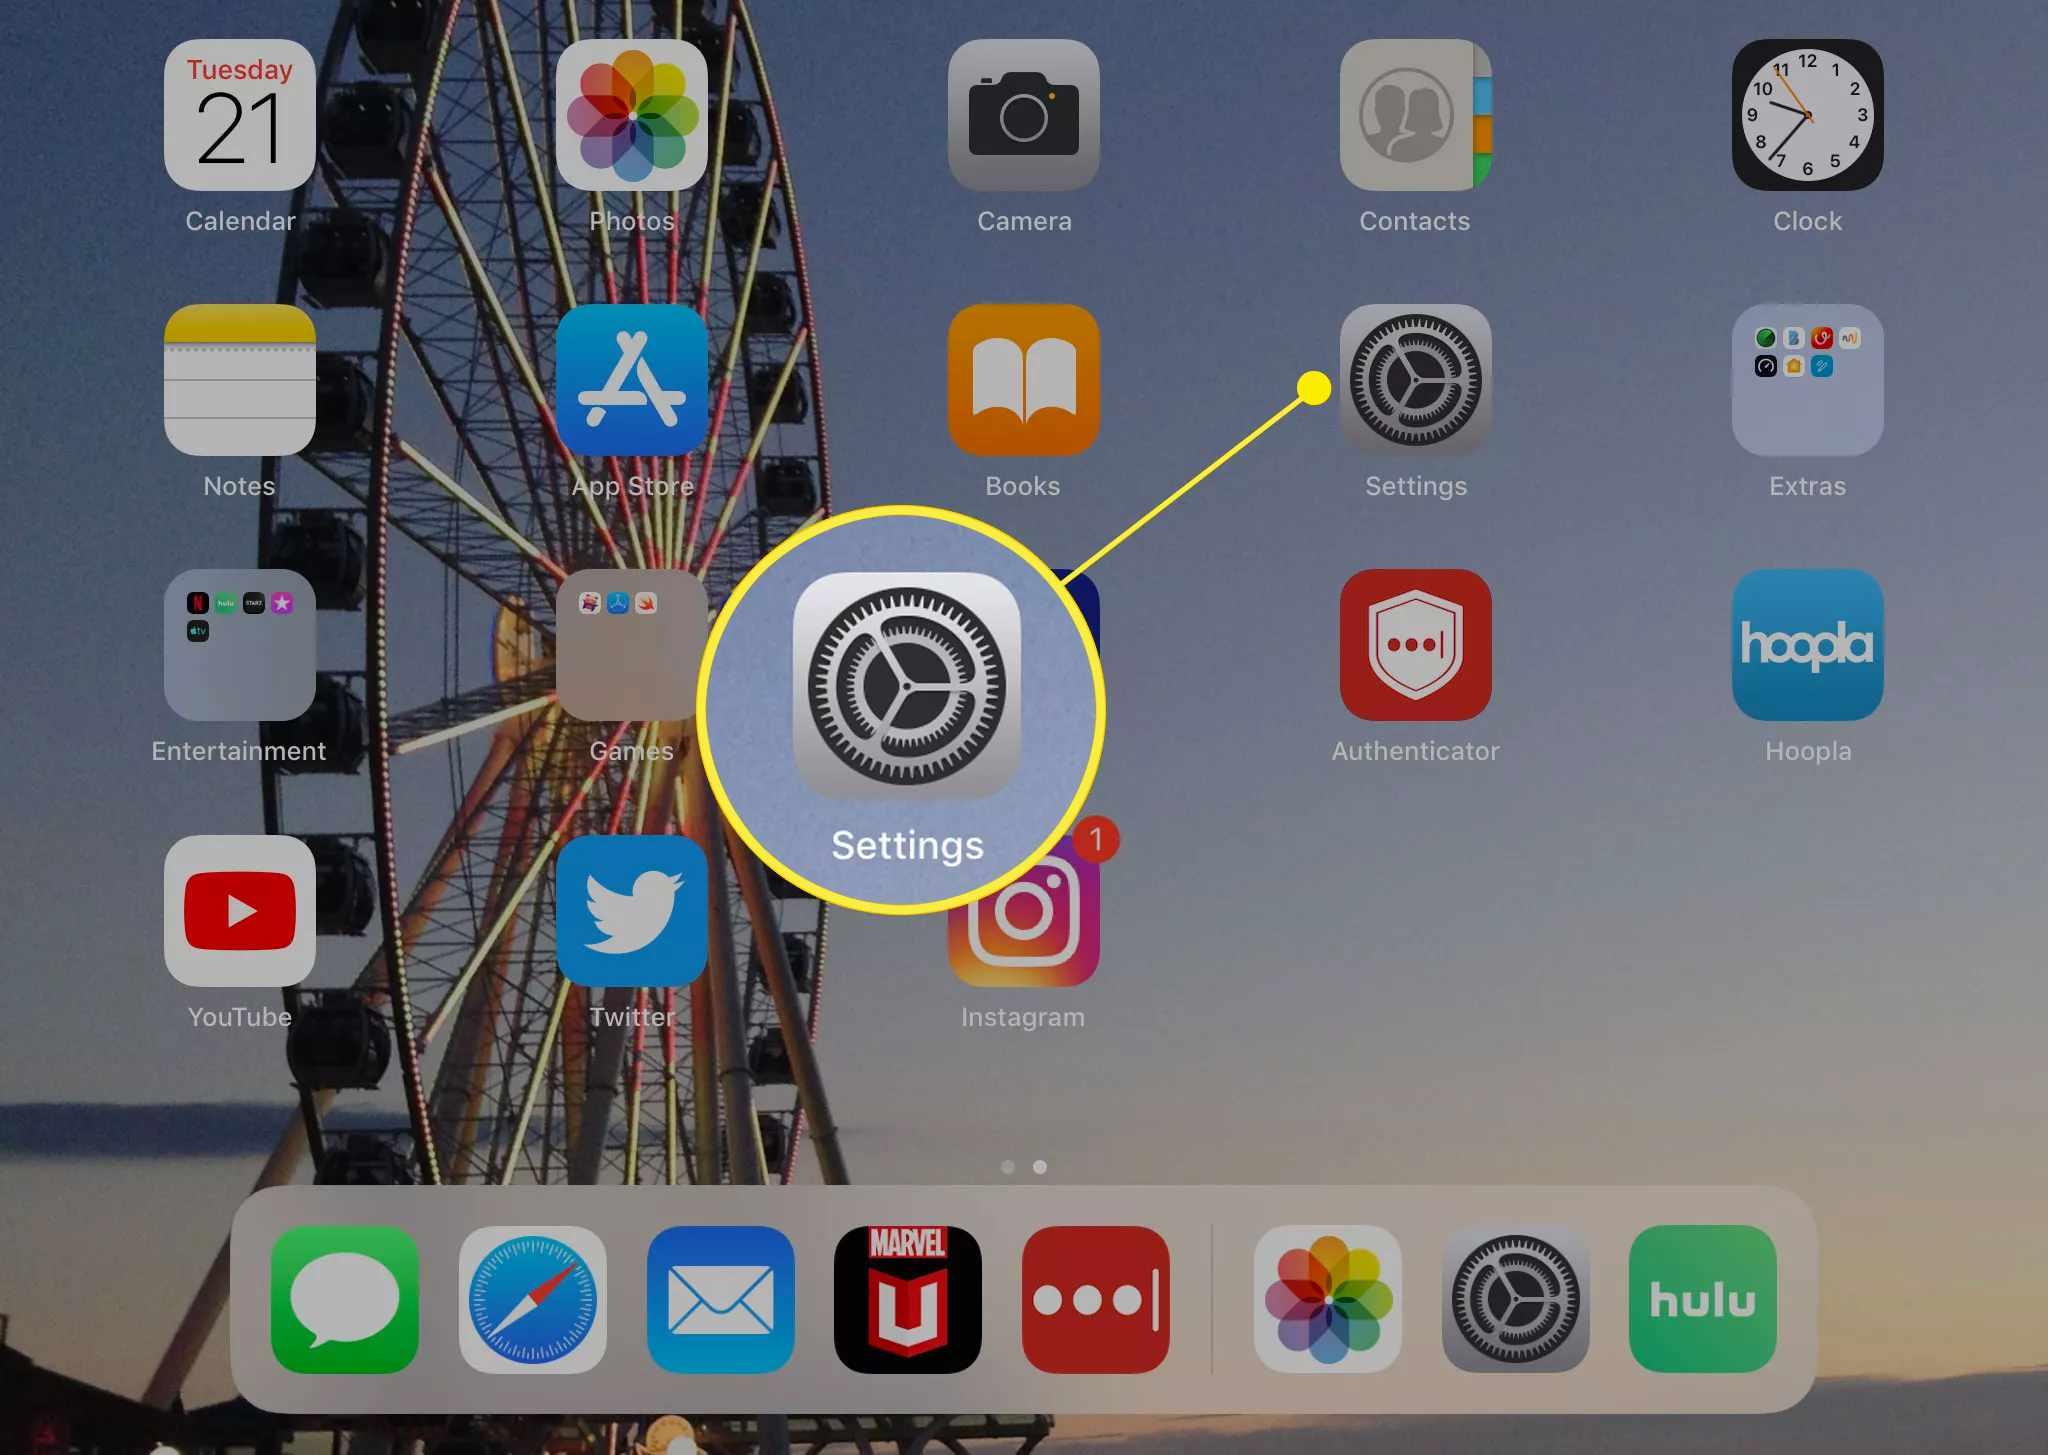 The Settings app on the iPad home screen